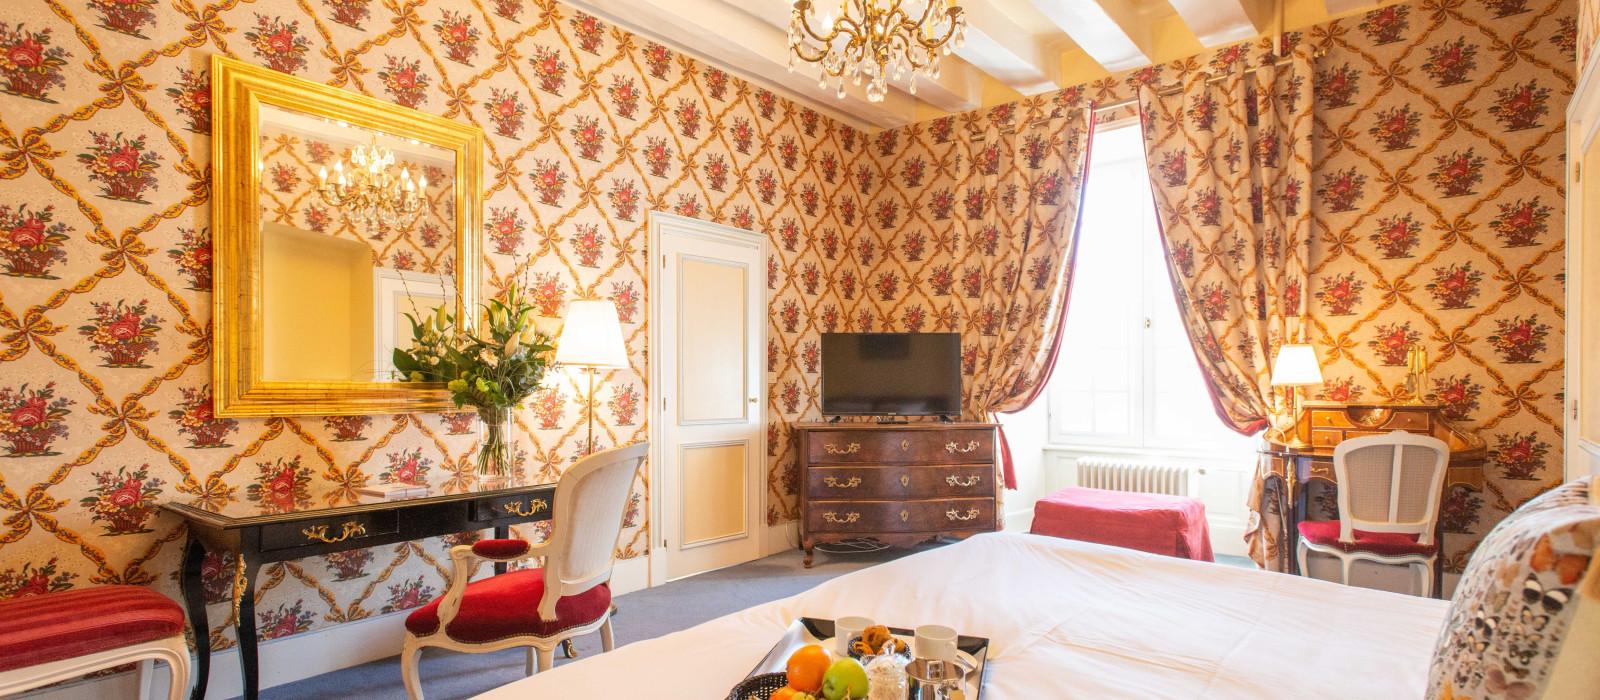 Hotel Chateau de Beauvois France